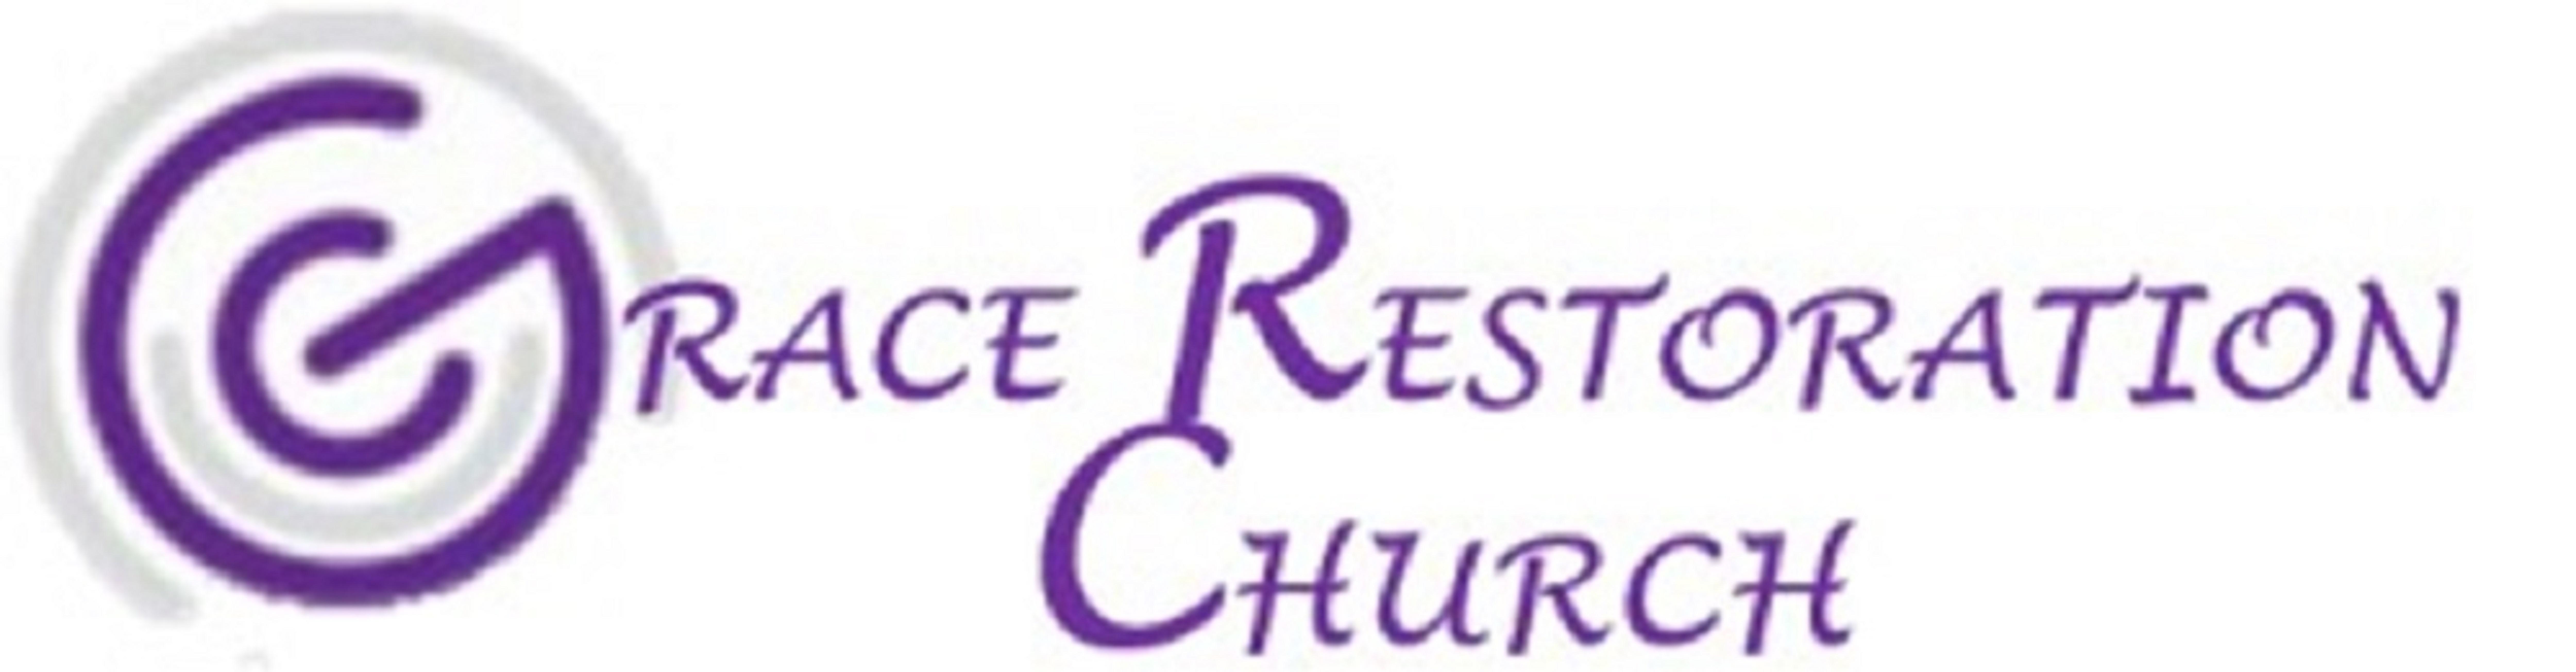 Grace Restoration Church